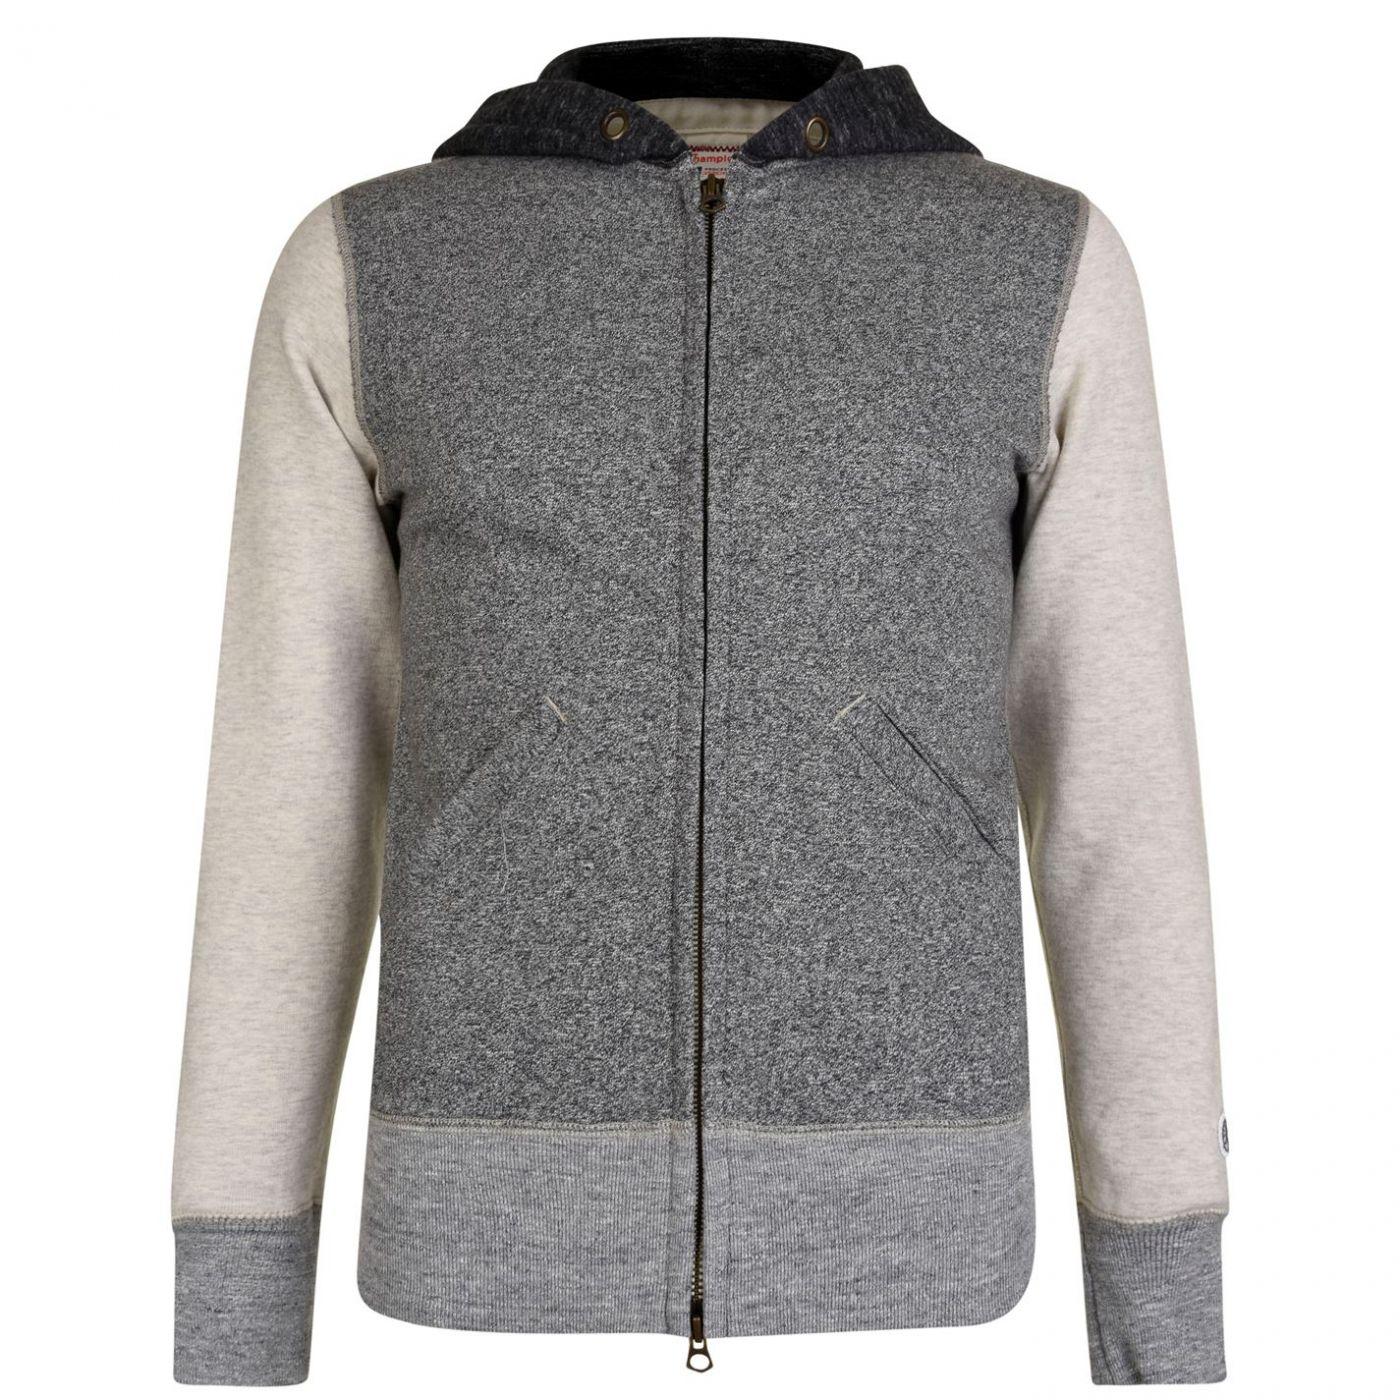 Champion Zipped Hooded Sweatshirt